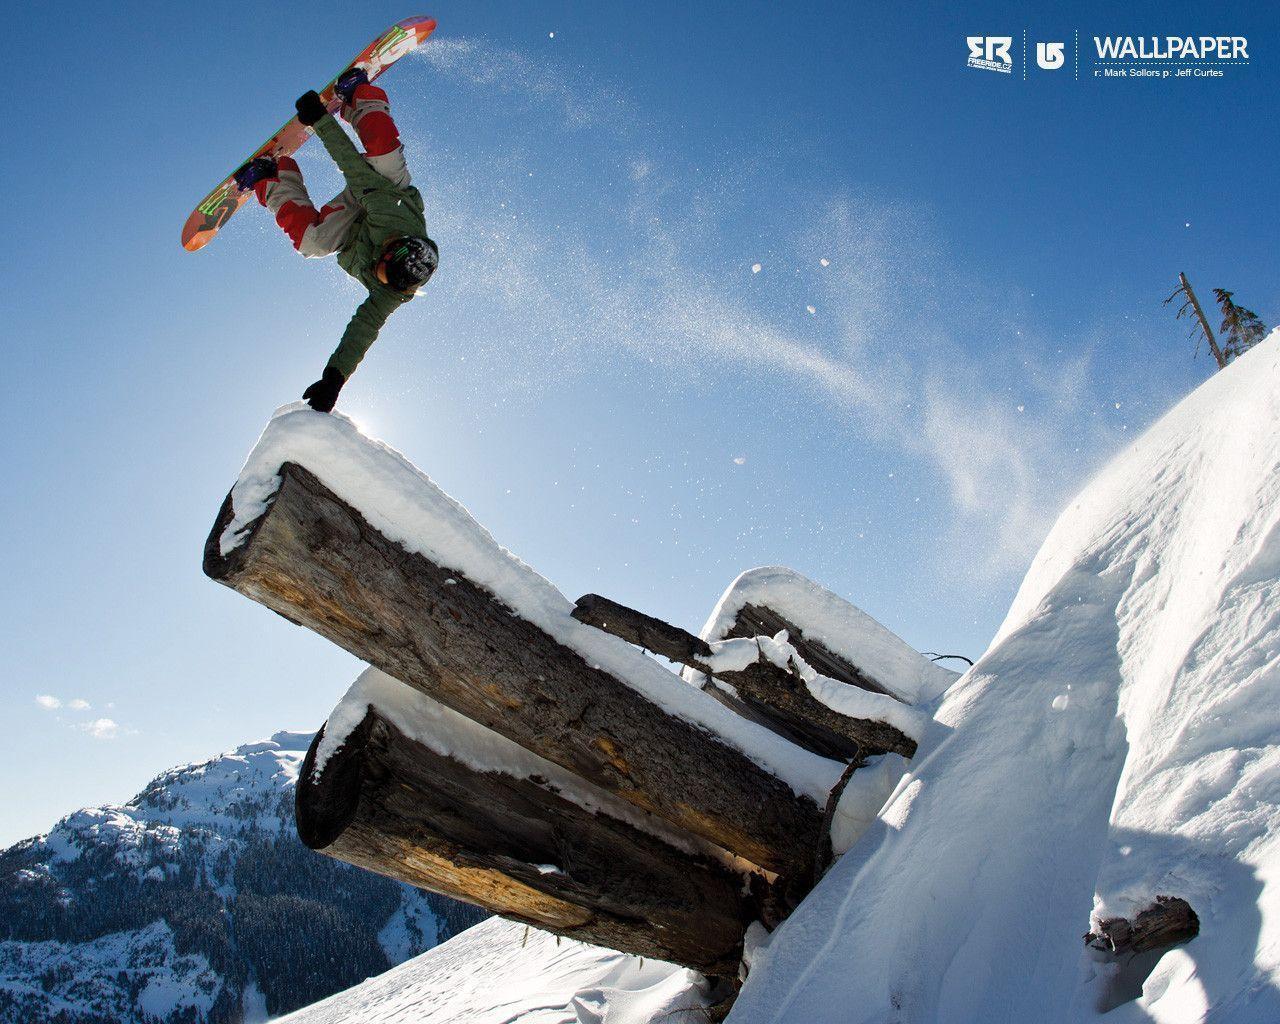 burton snowboard wallpapers wallpaper cave